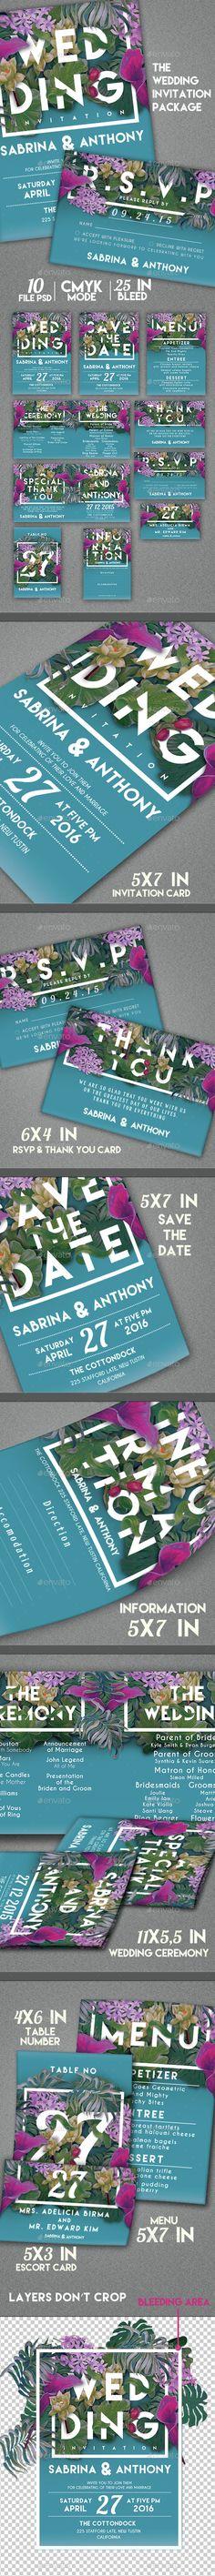 wedding invitation design psd%0A Love Ceremony  Wedding PSD Template  PSD Templates   ThemeForest    Project   Pinterest   Wedding   Ceremony and Psd templates